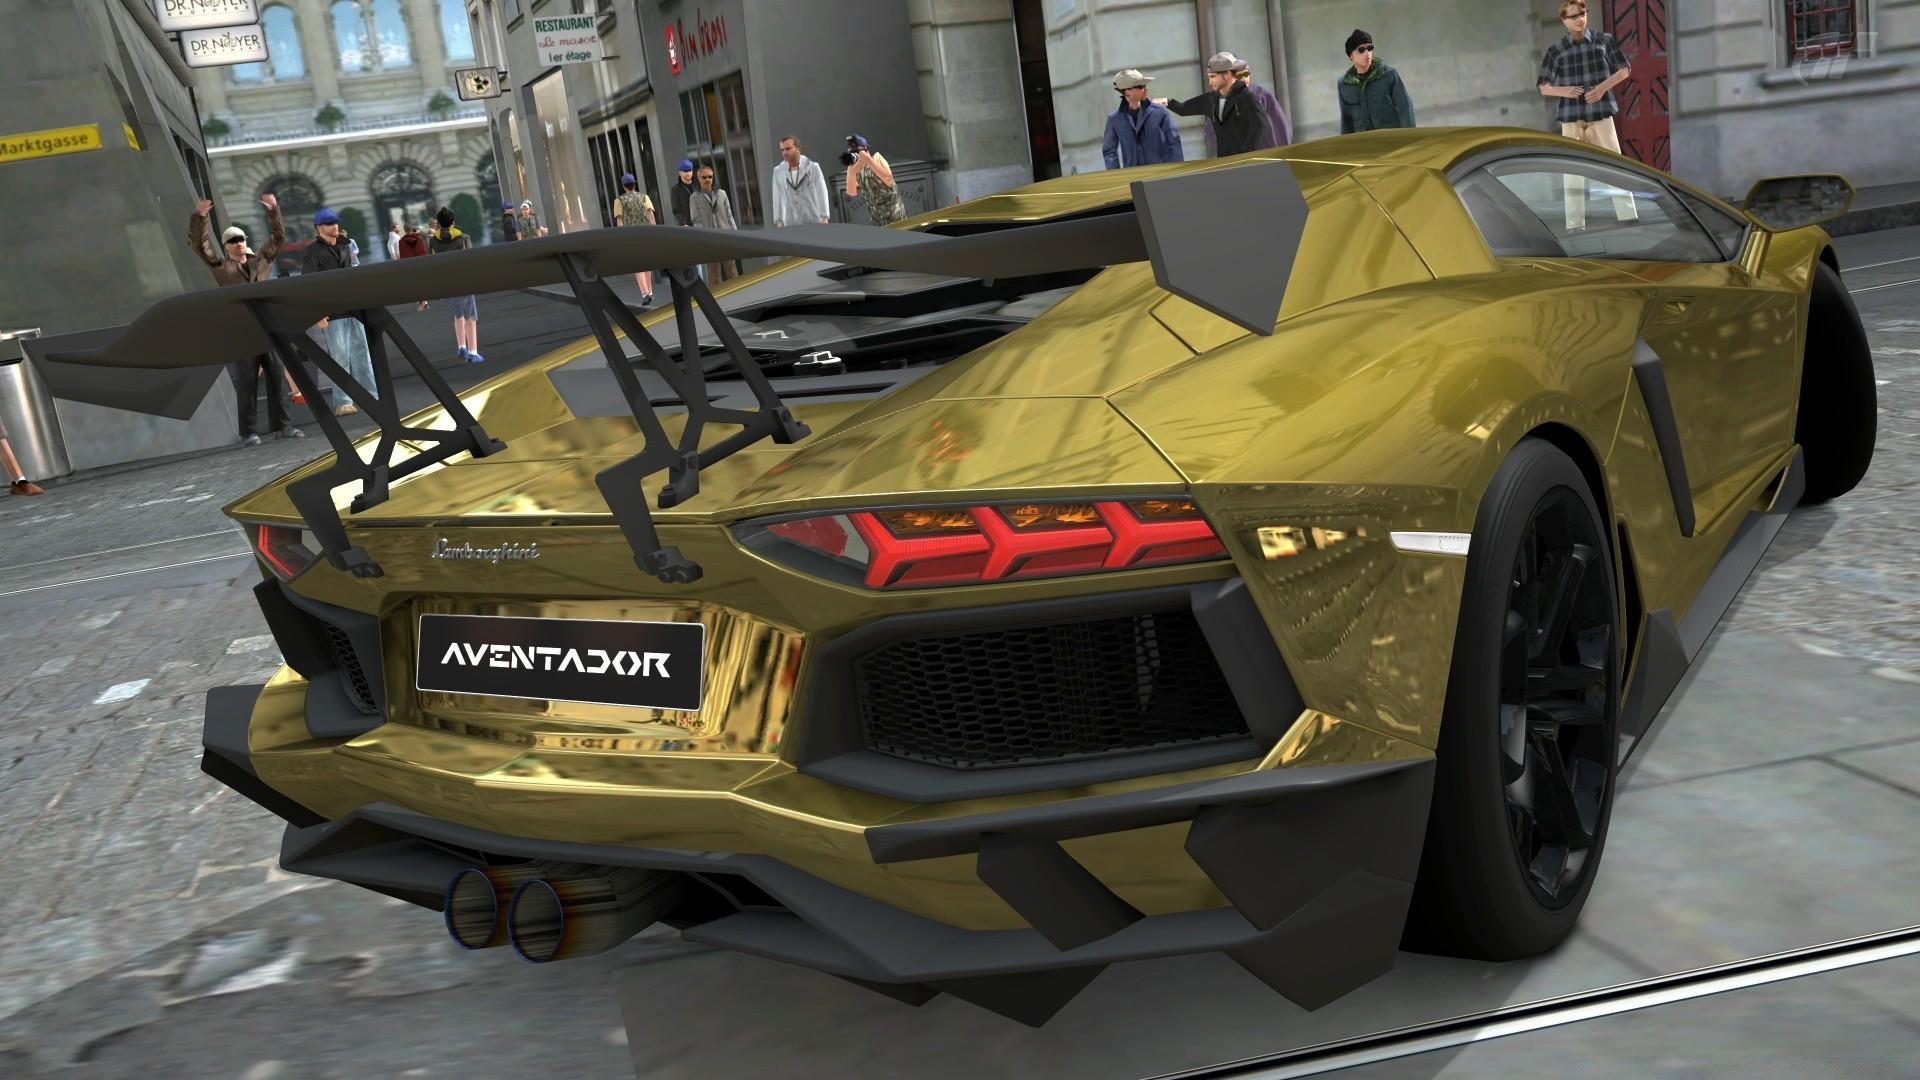 Lamborghini Aventador LP700 4 Gold Chrome Gran Turismo 5 IPhone Wallpapers For Free